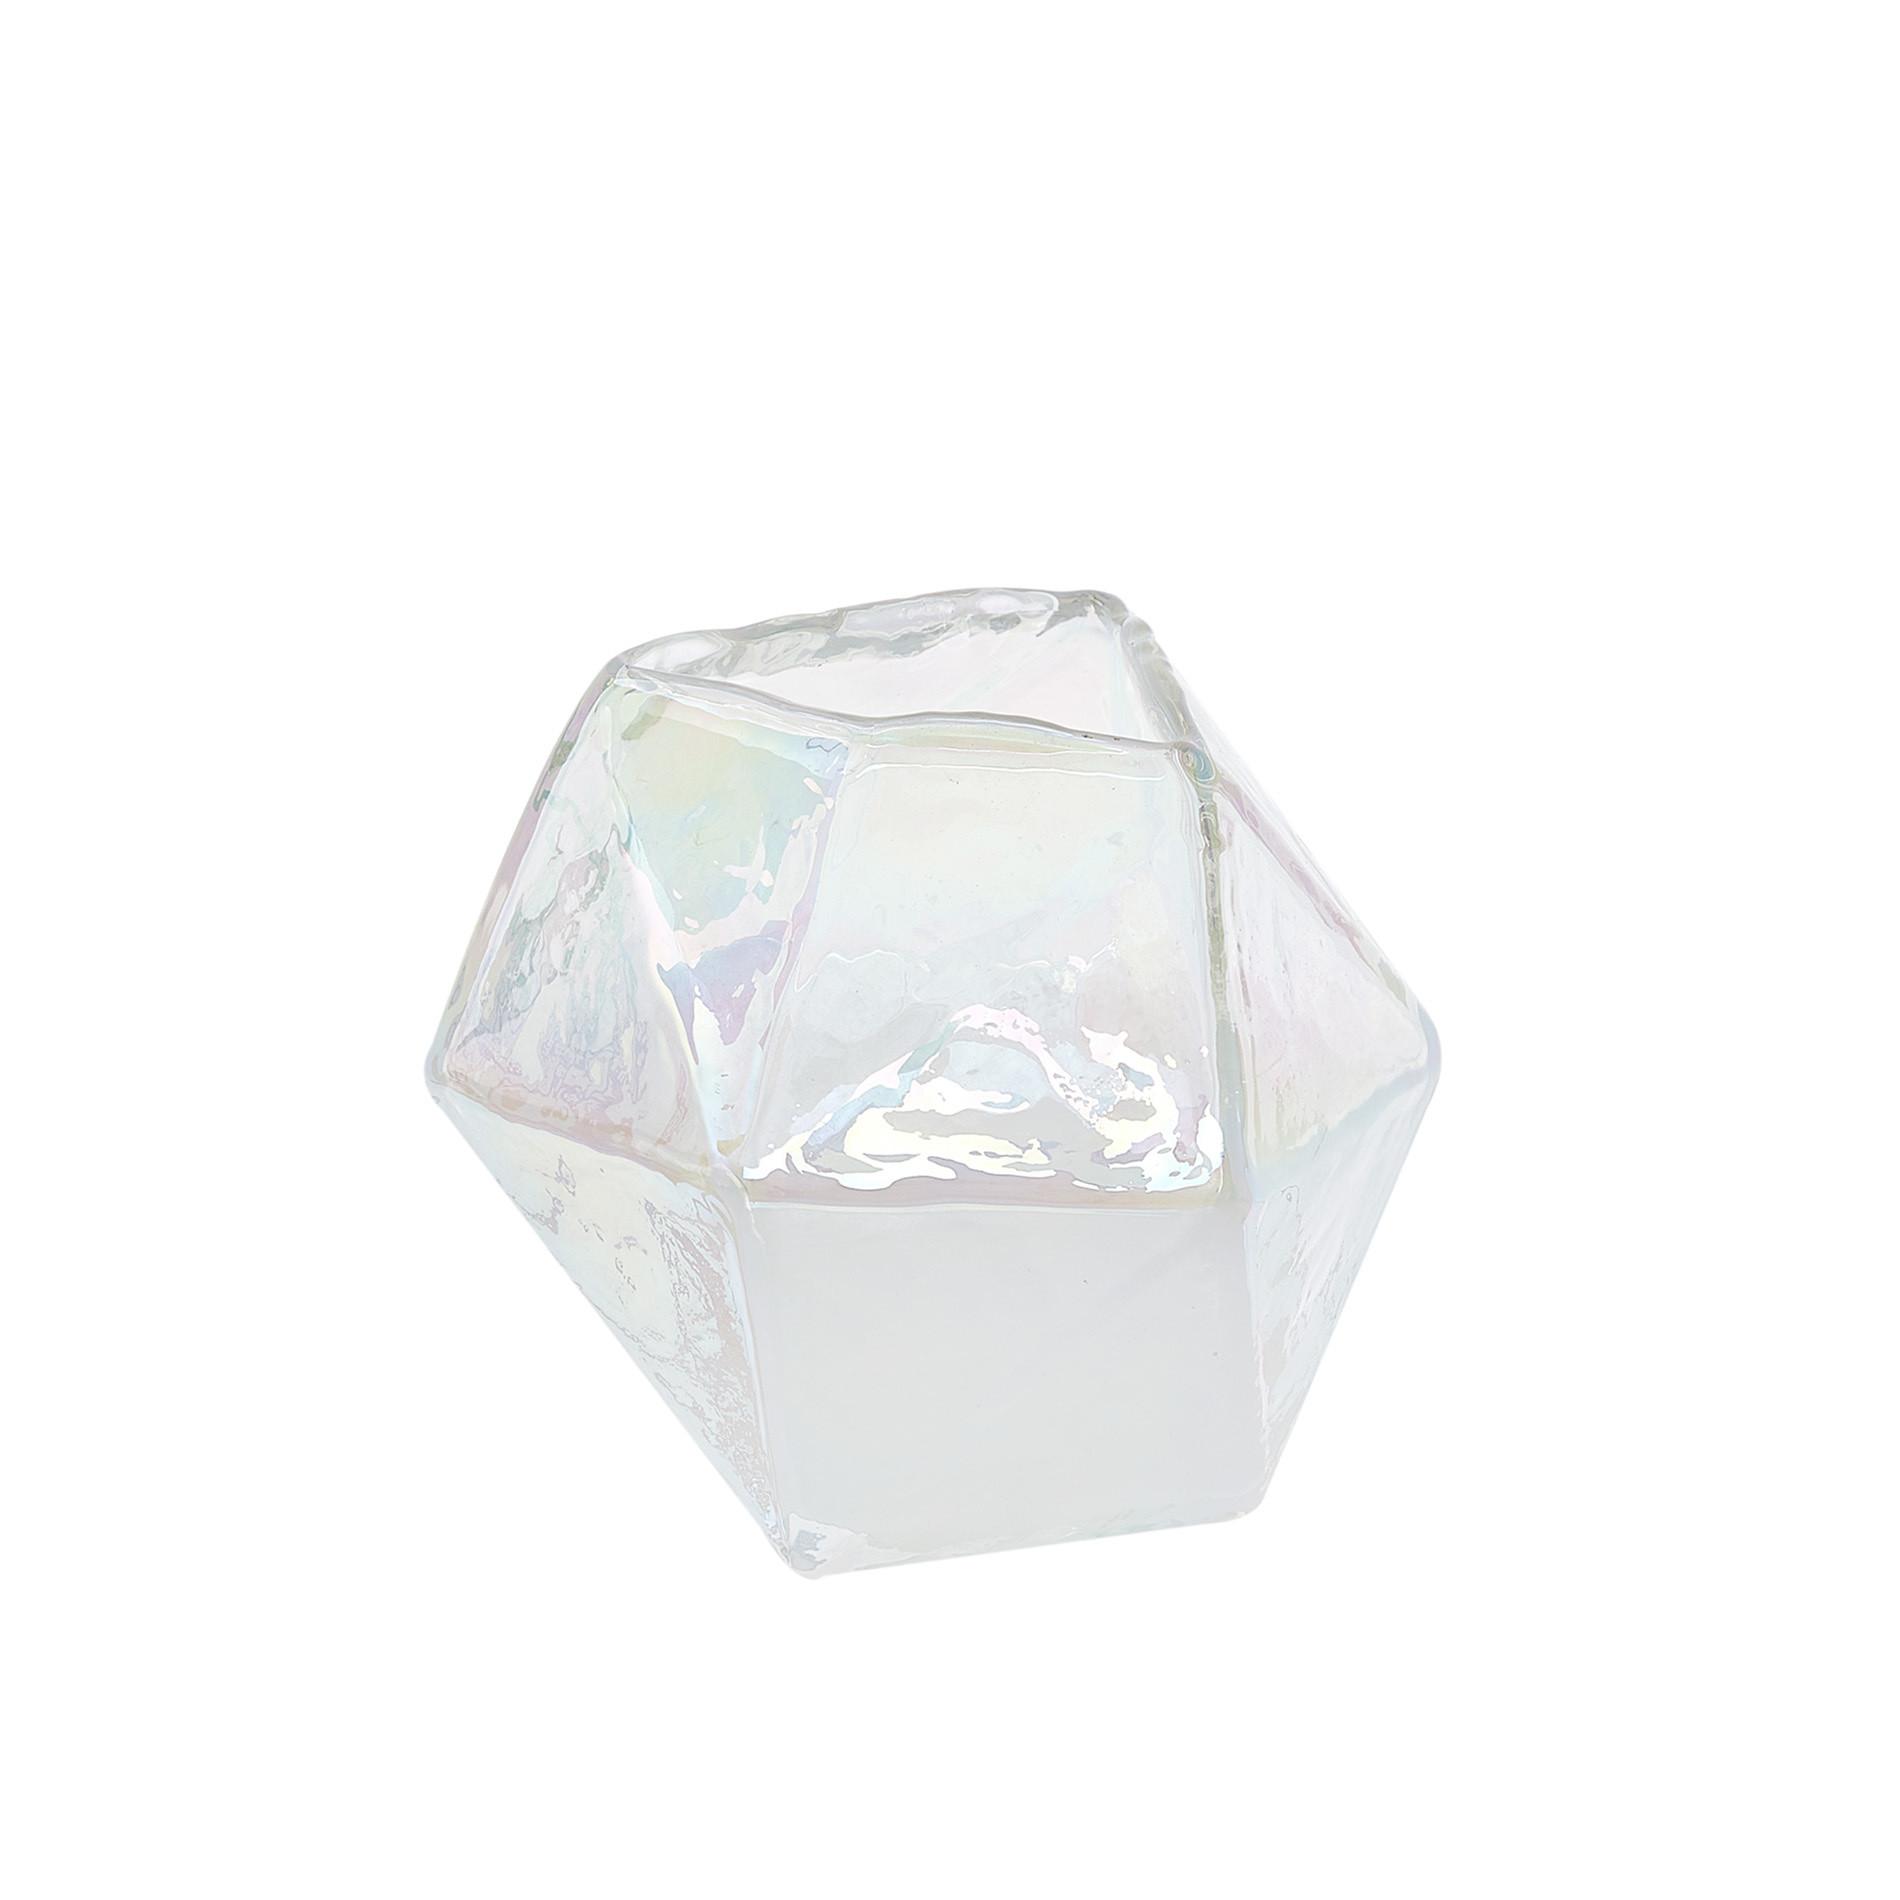 Vaso prisma vetro colorato in pasta, Grigio perla, large image number 0